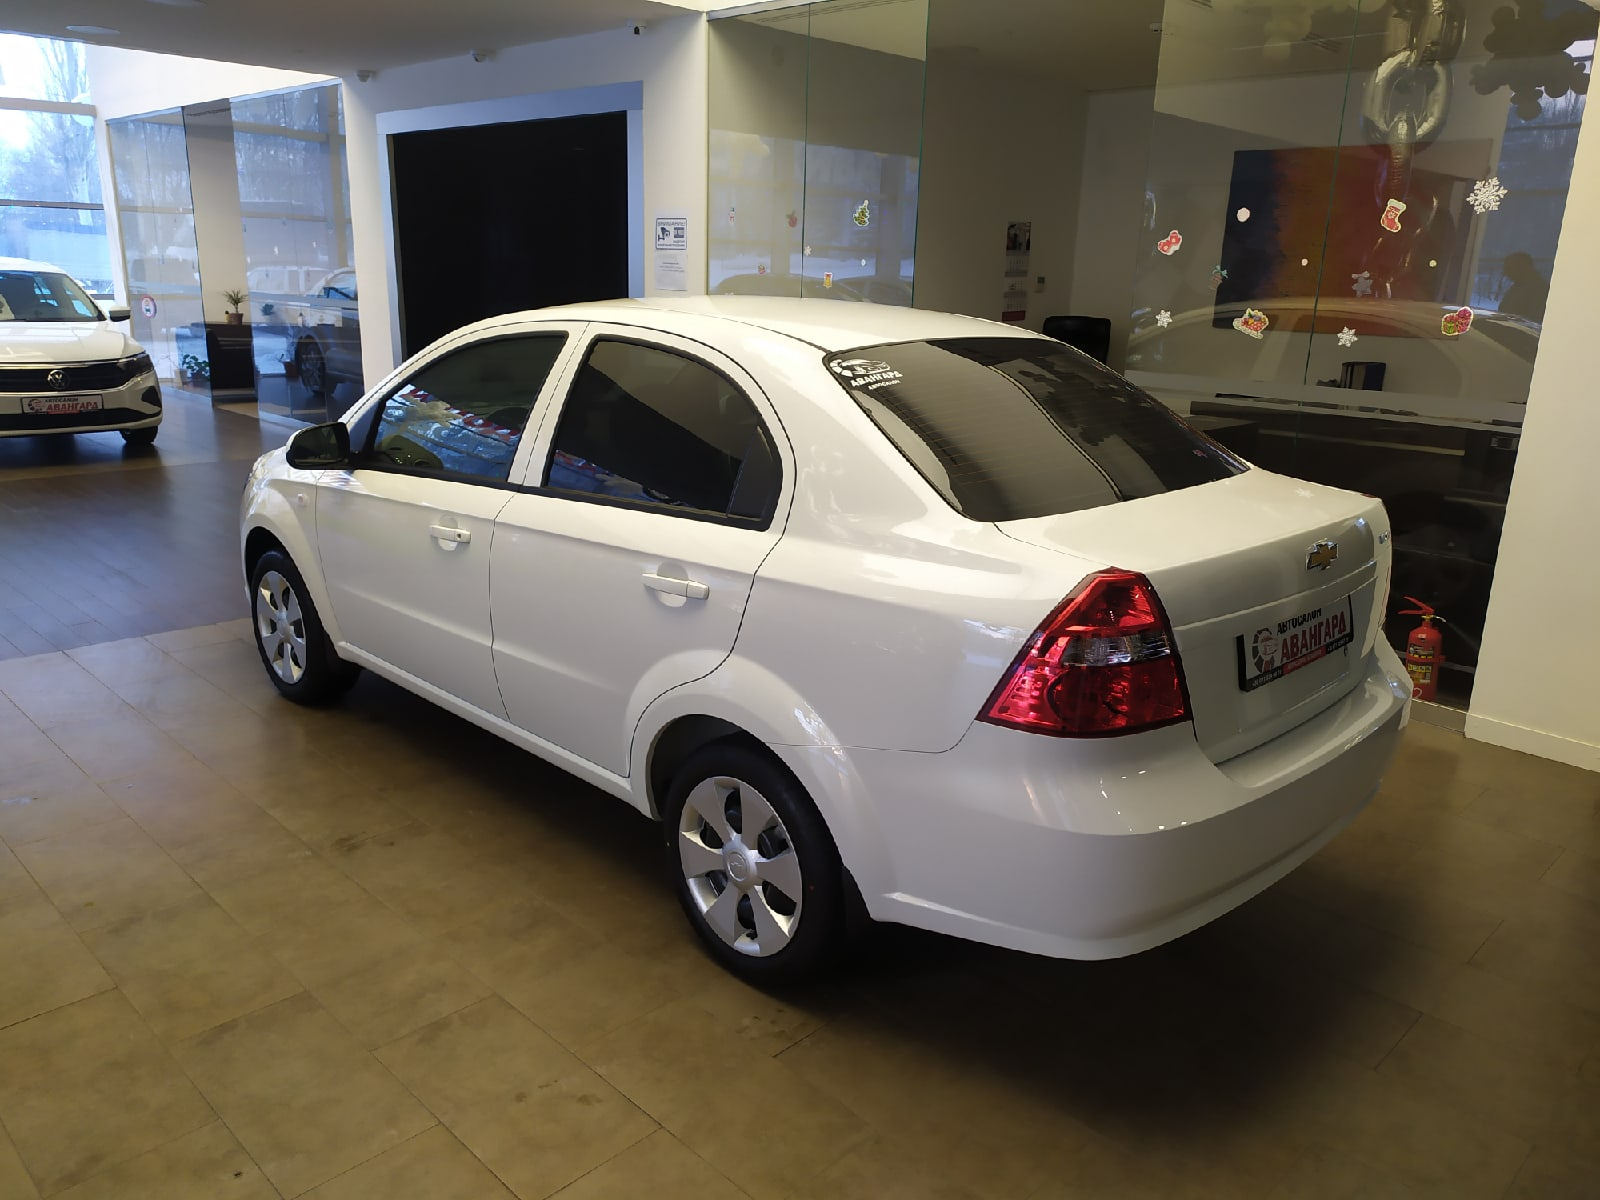 Chevrolet Nexia 1.5 16 кл. (105 л.с.) 5МТ комплектации LT, цвет белый